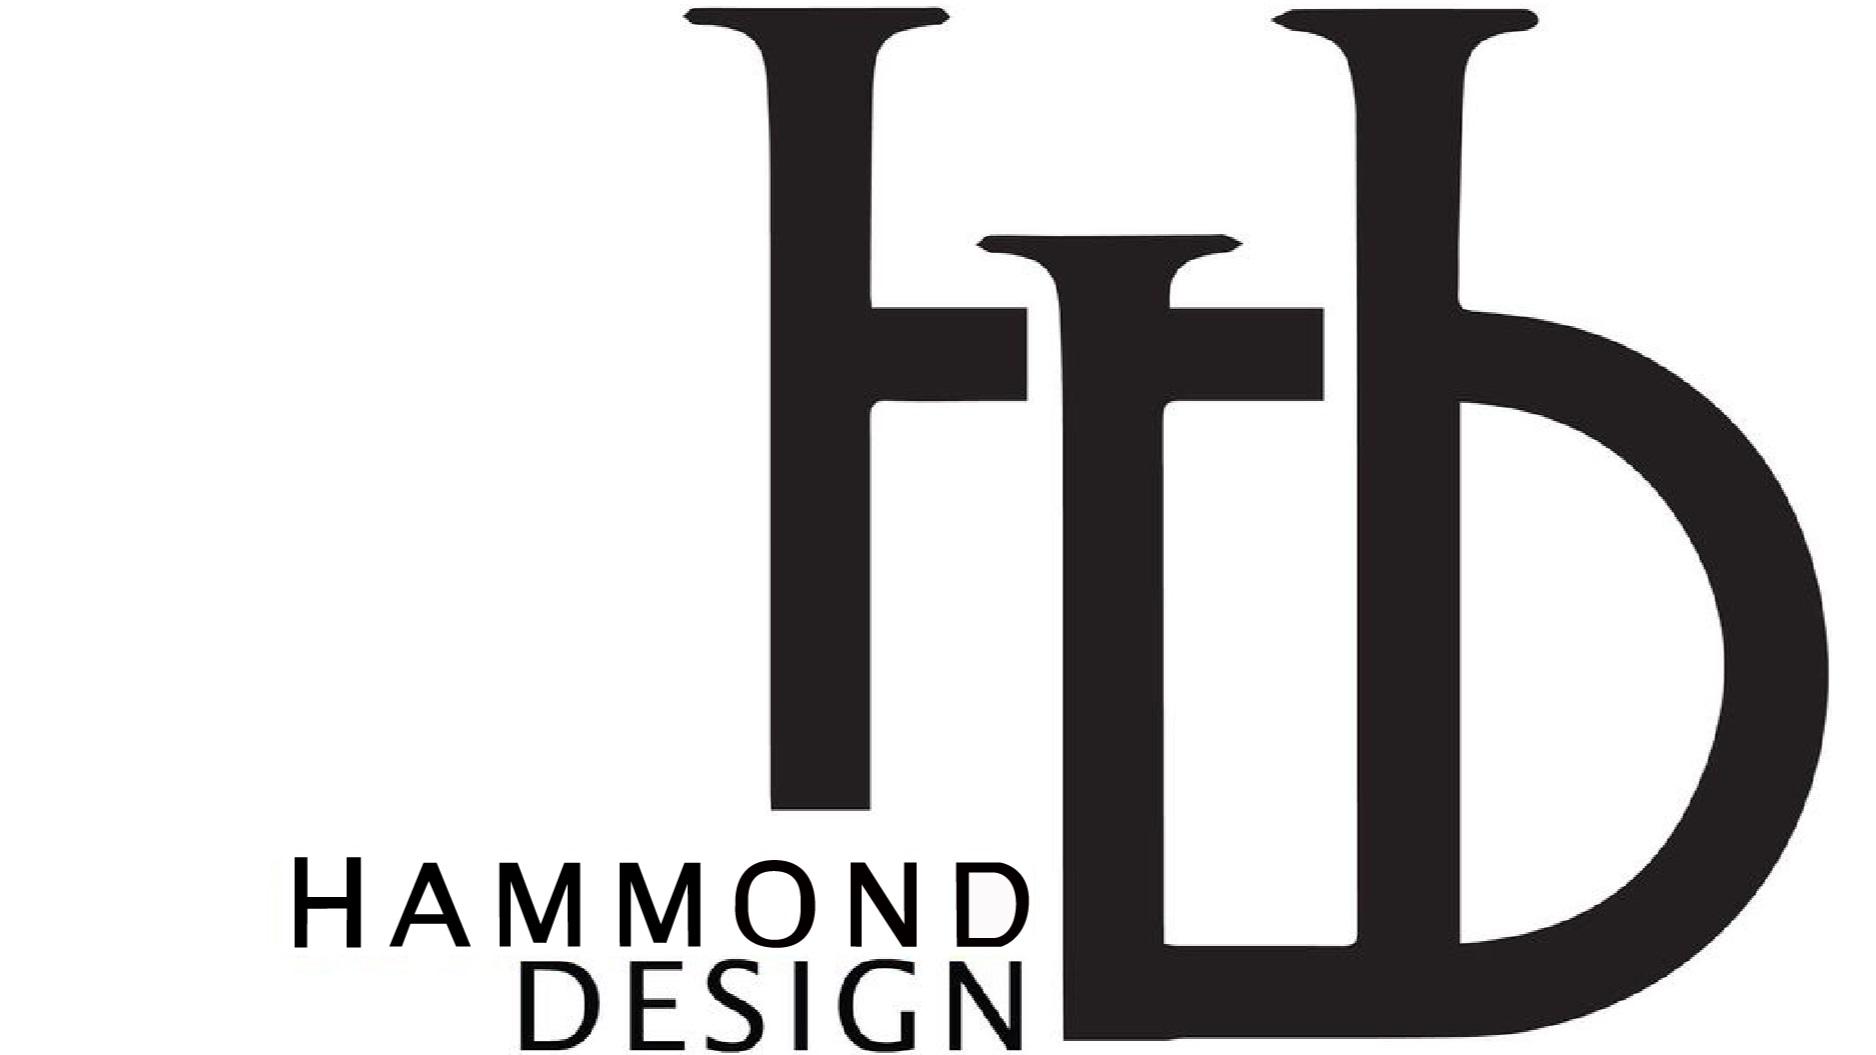 hammond+Design+New.jpg